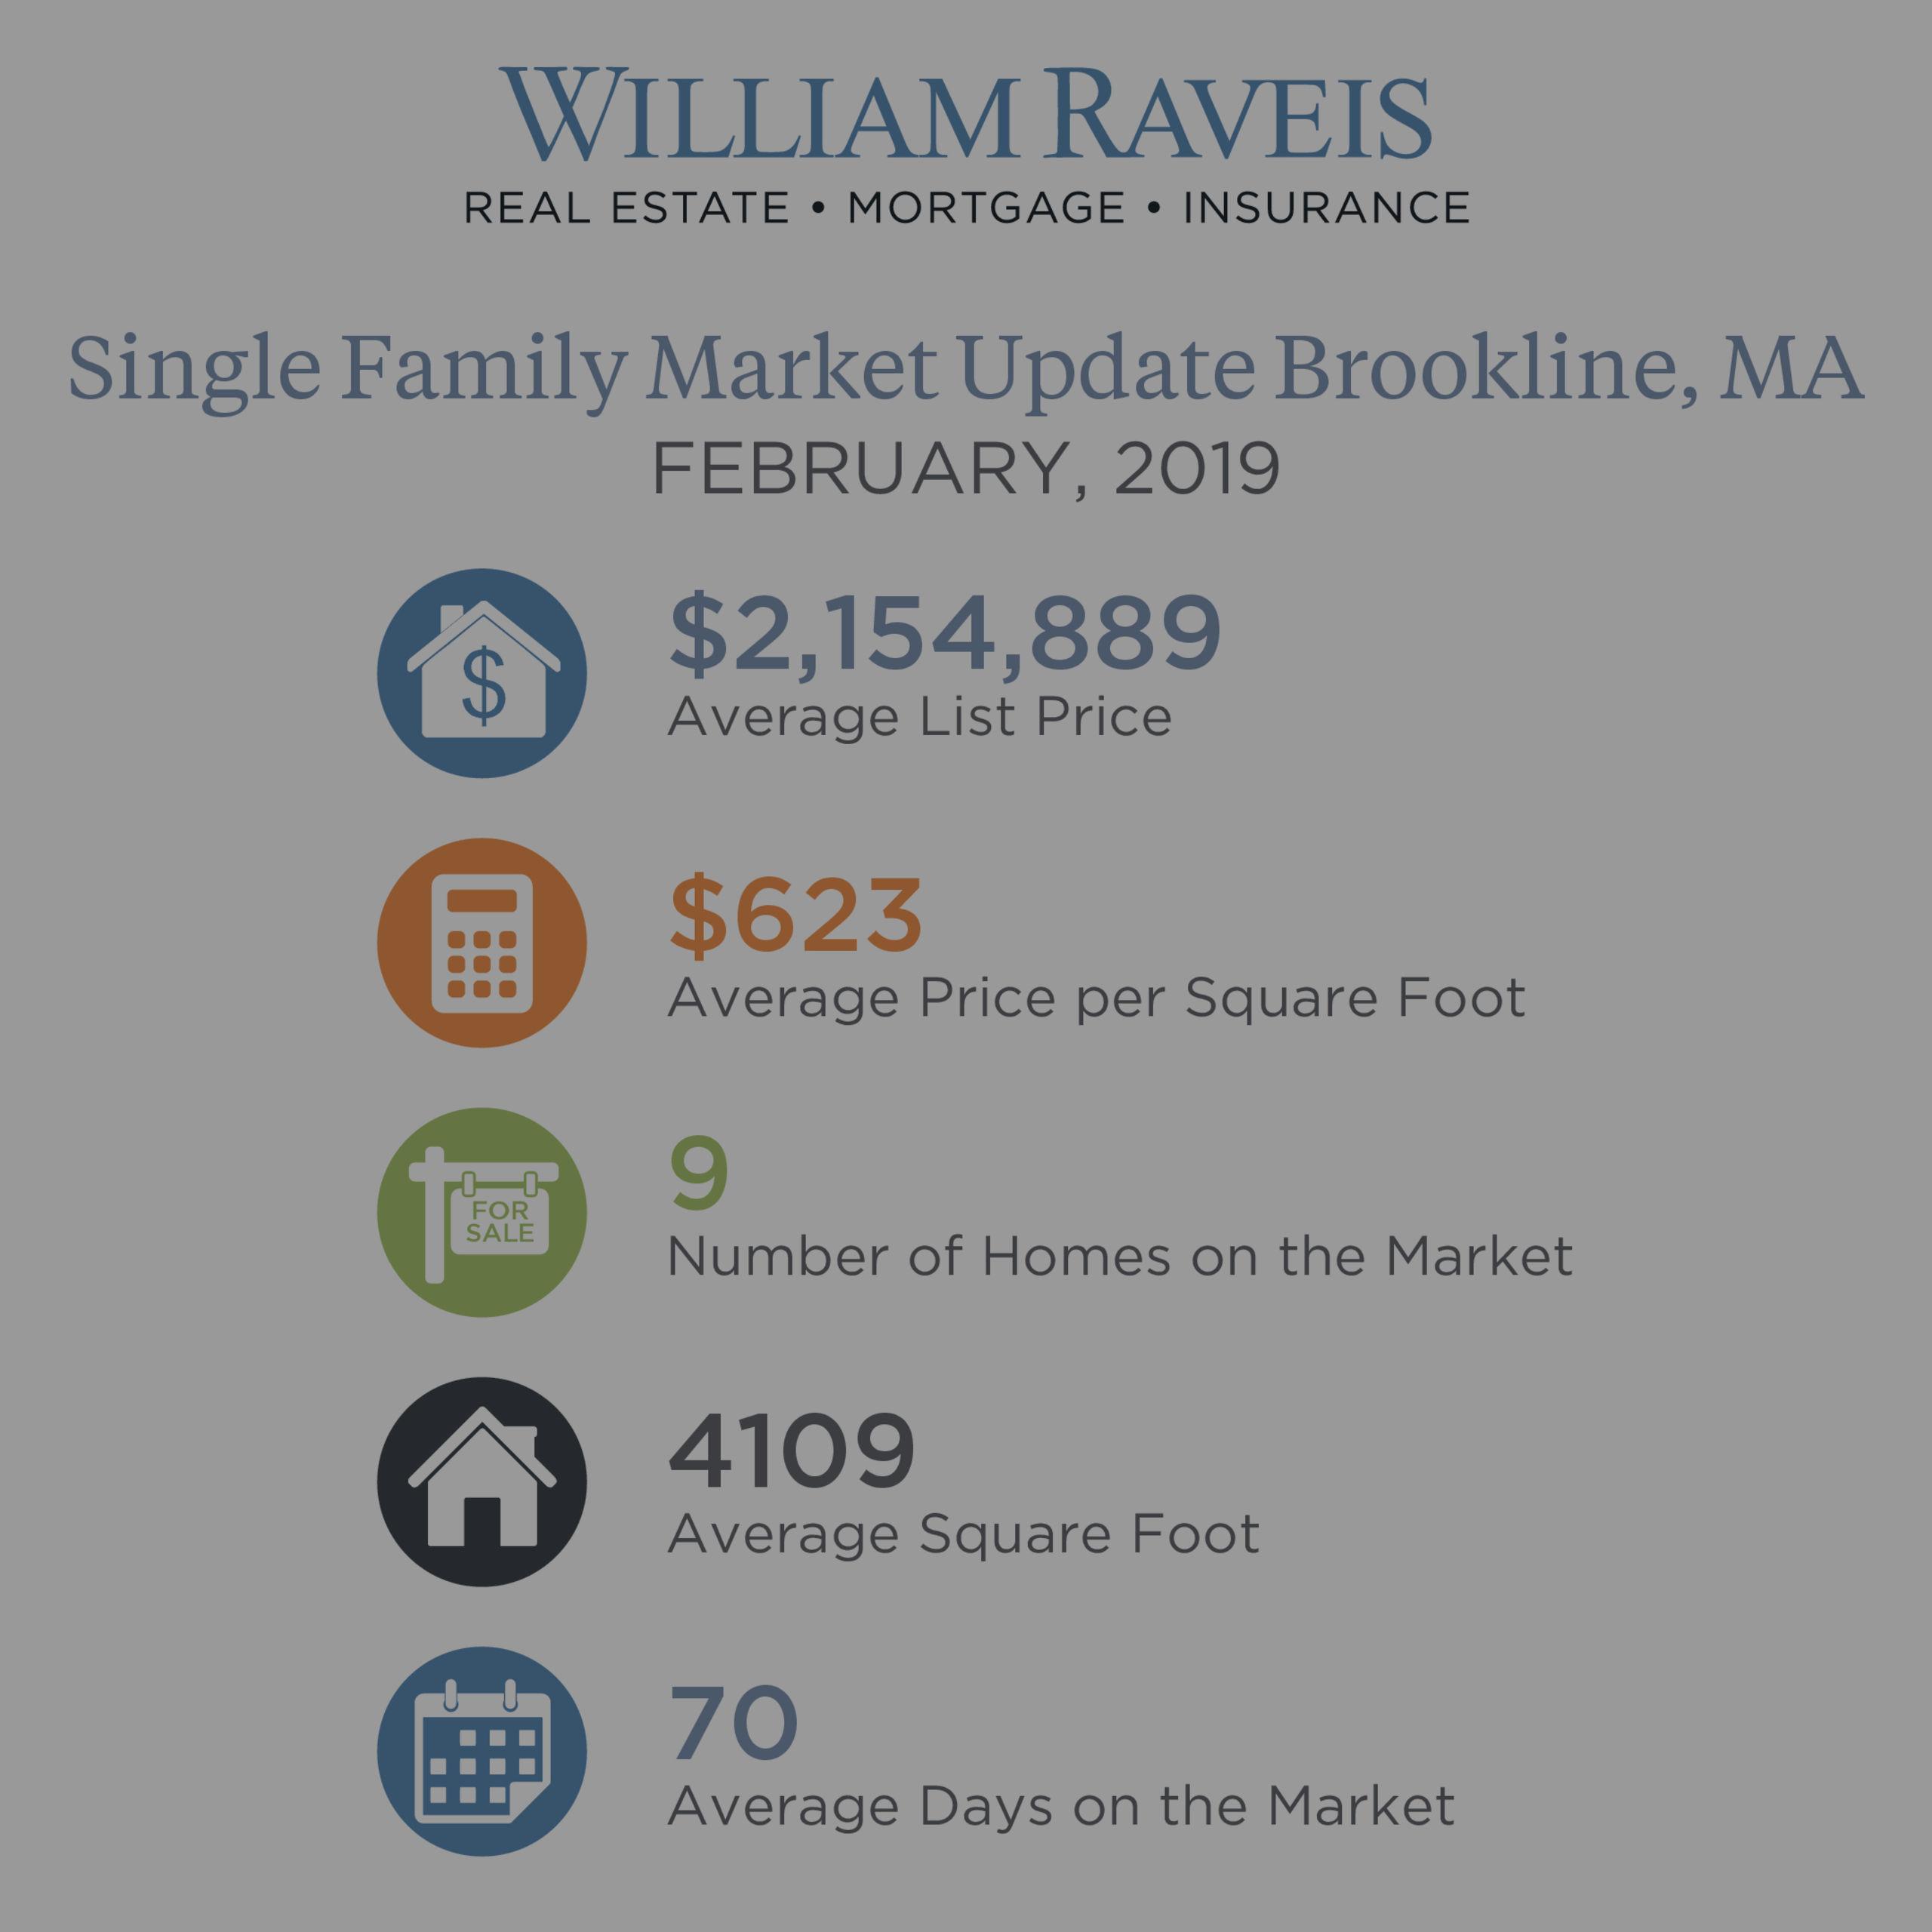 Brookline Single Family & Condominium Housing Market Update February 2019